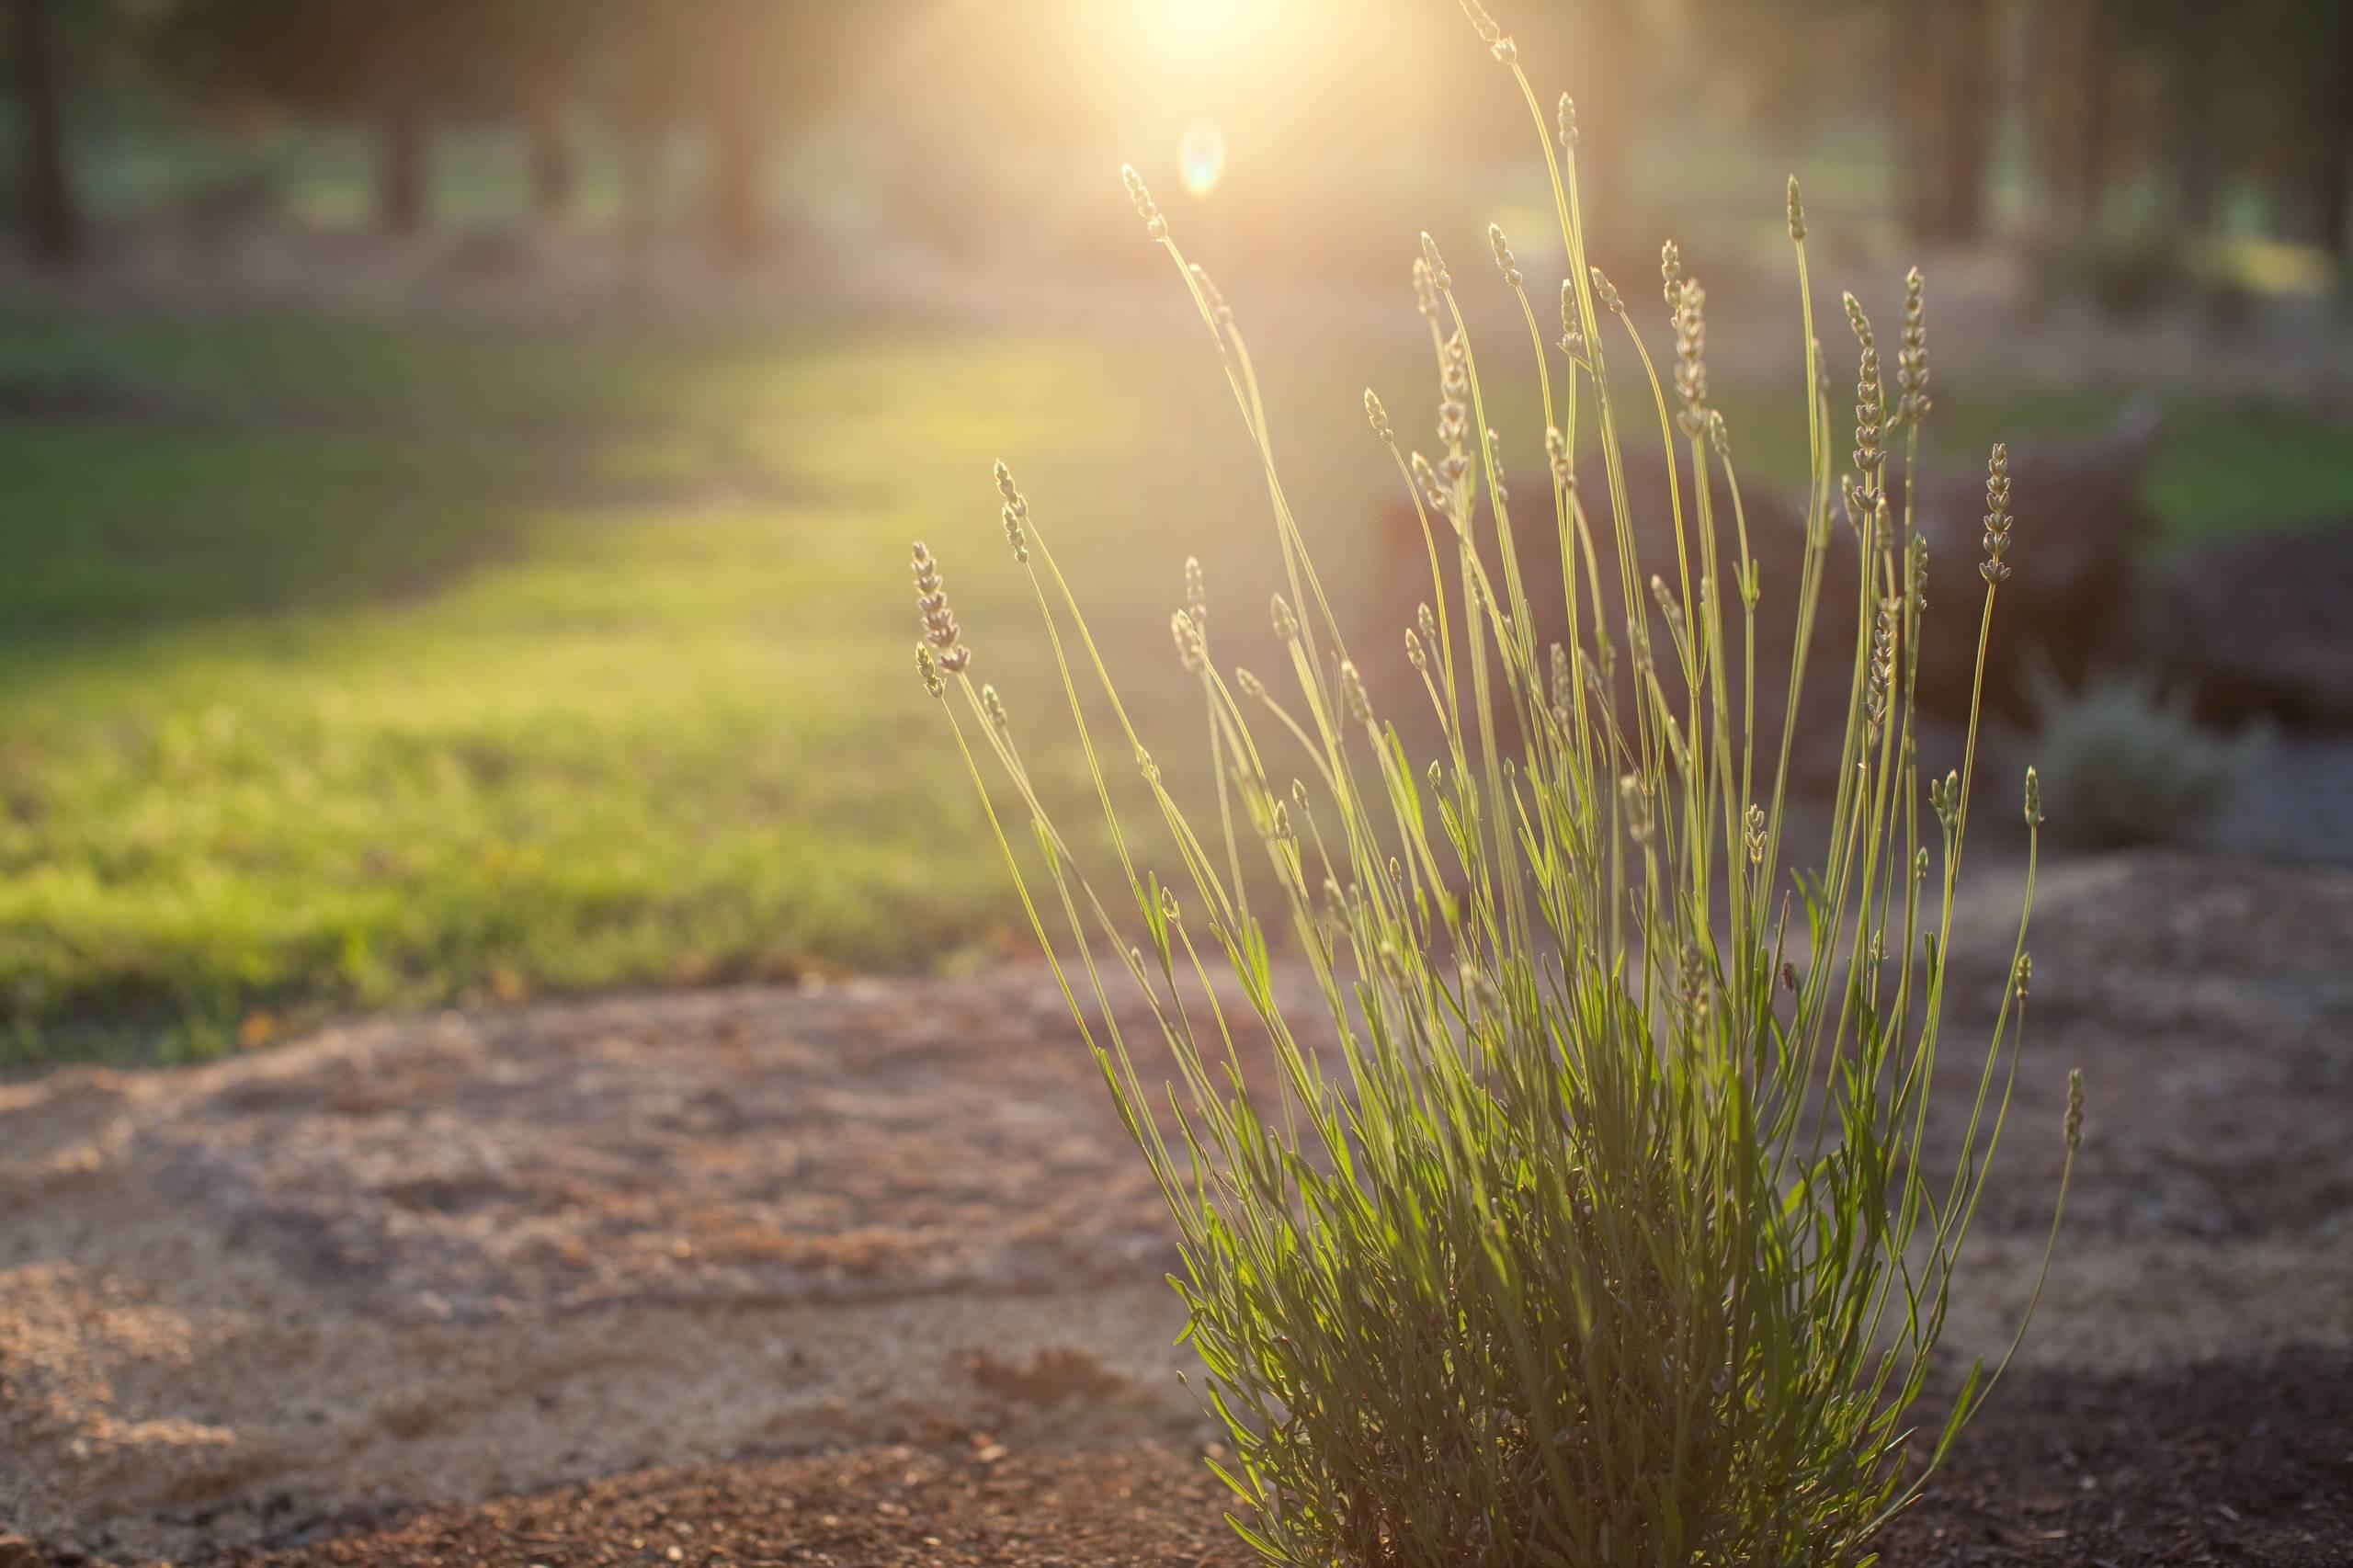 Plants in Focus